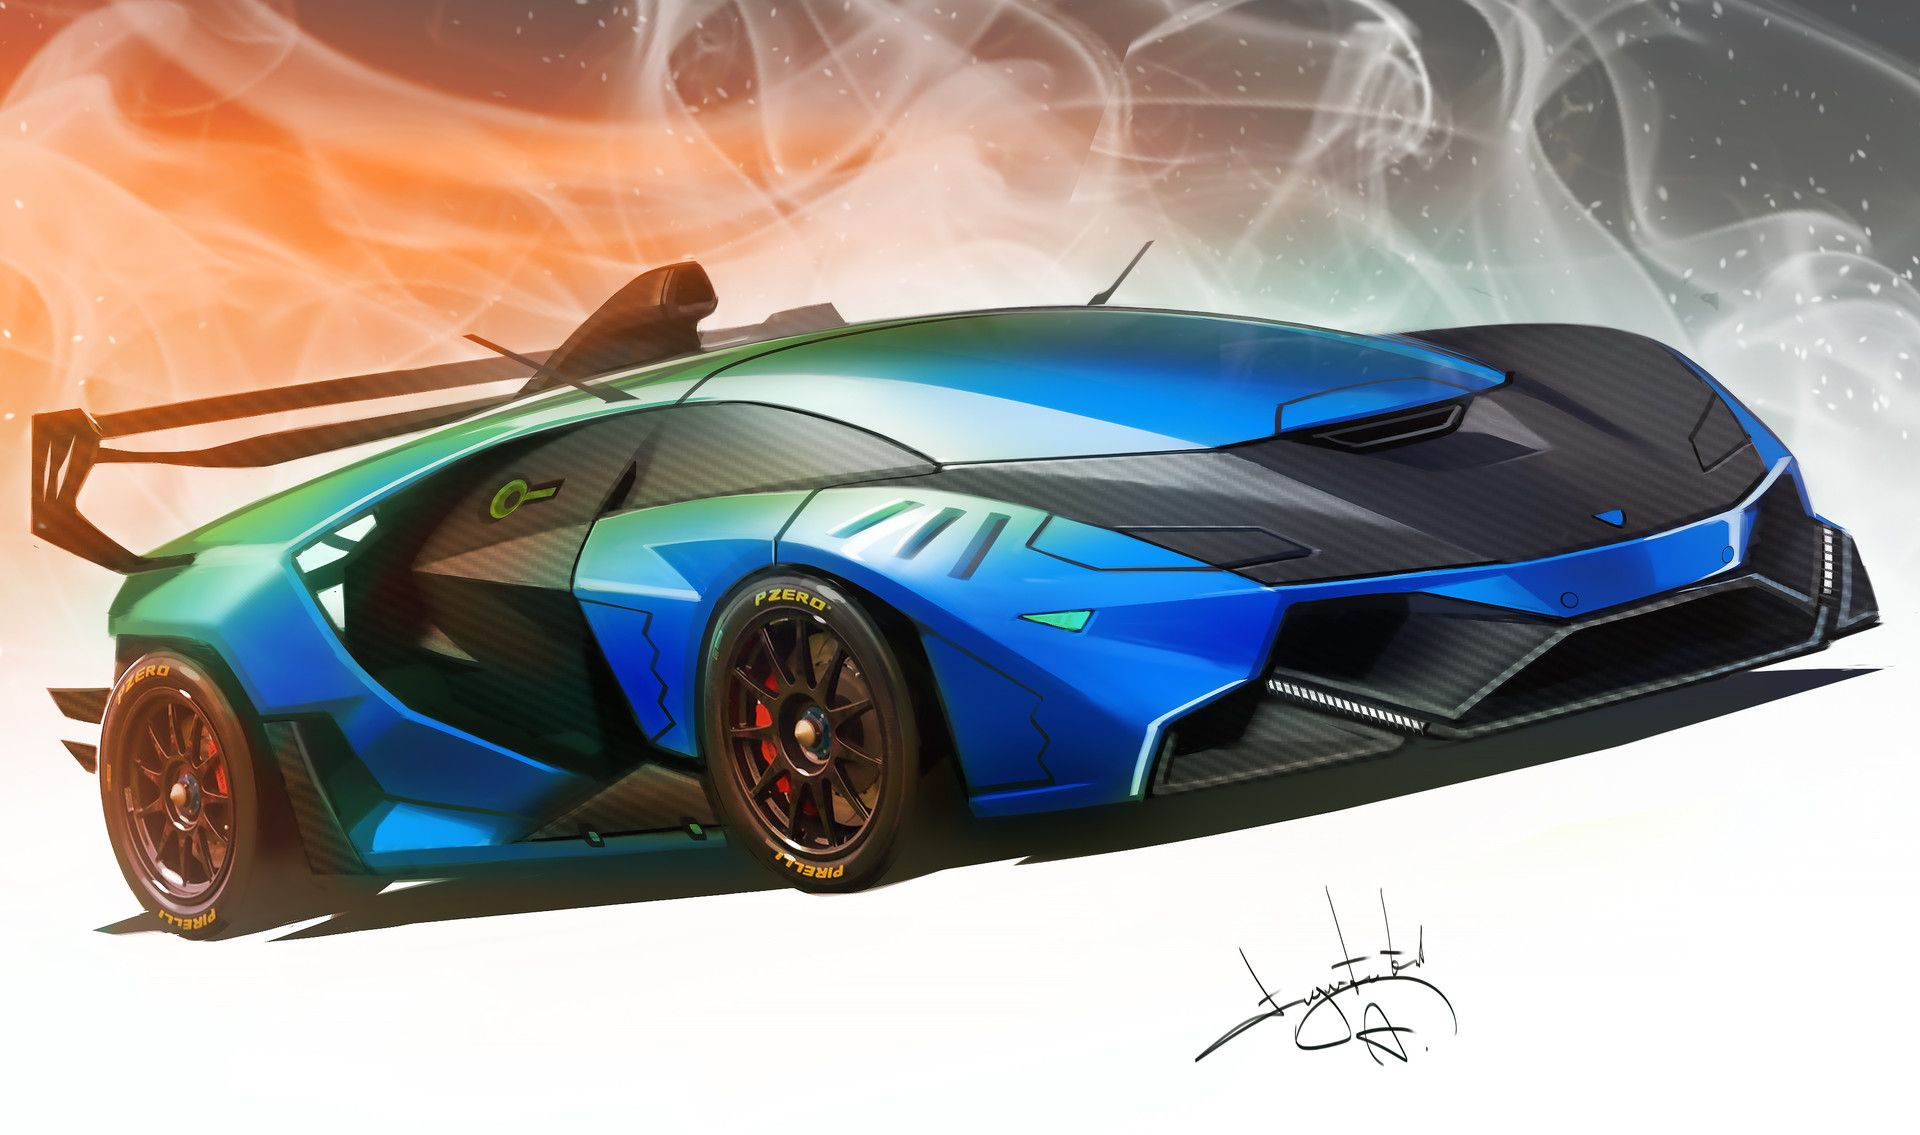 Artstation Lambo Aleksandr Sidelnikov Futuristic Cars Design Best Luxury Cars Sports Cars Lamborghini